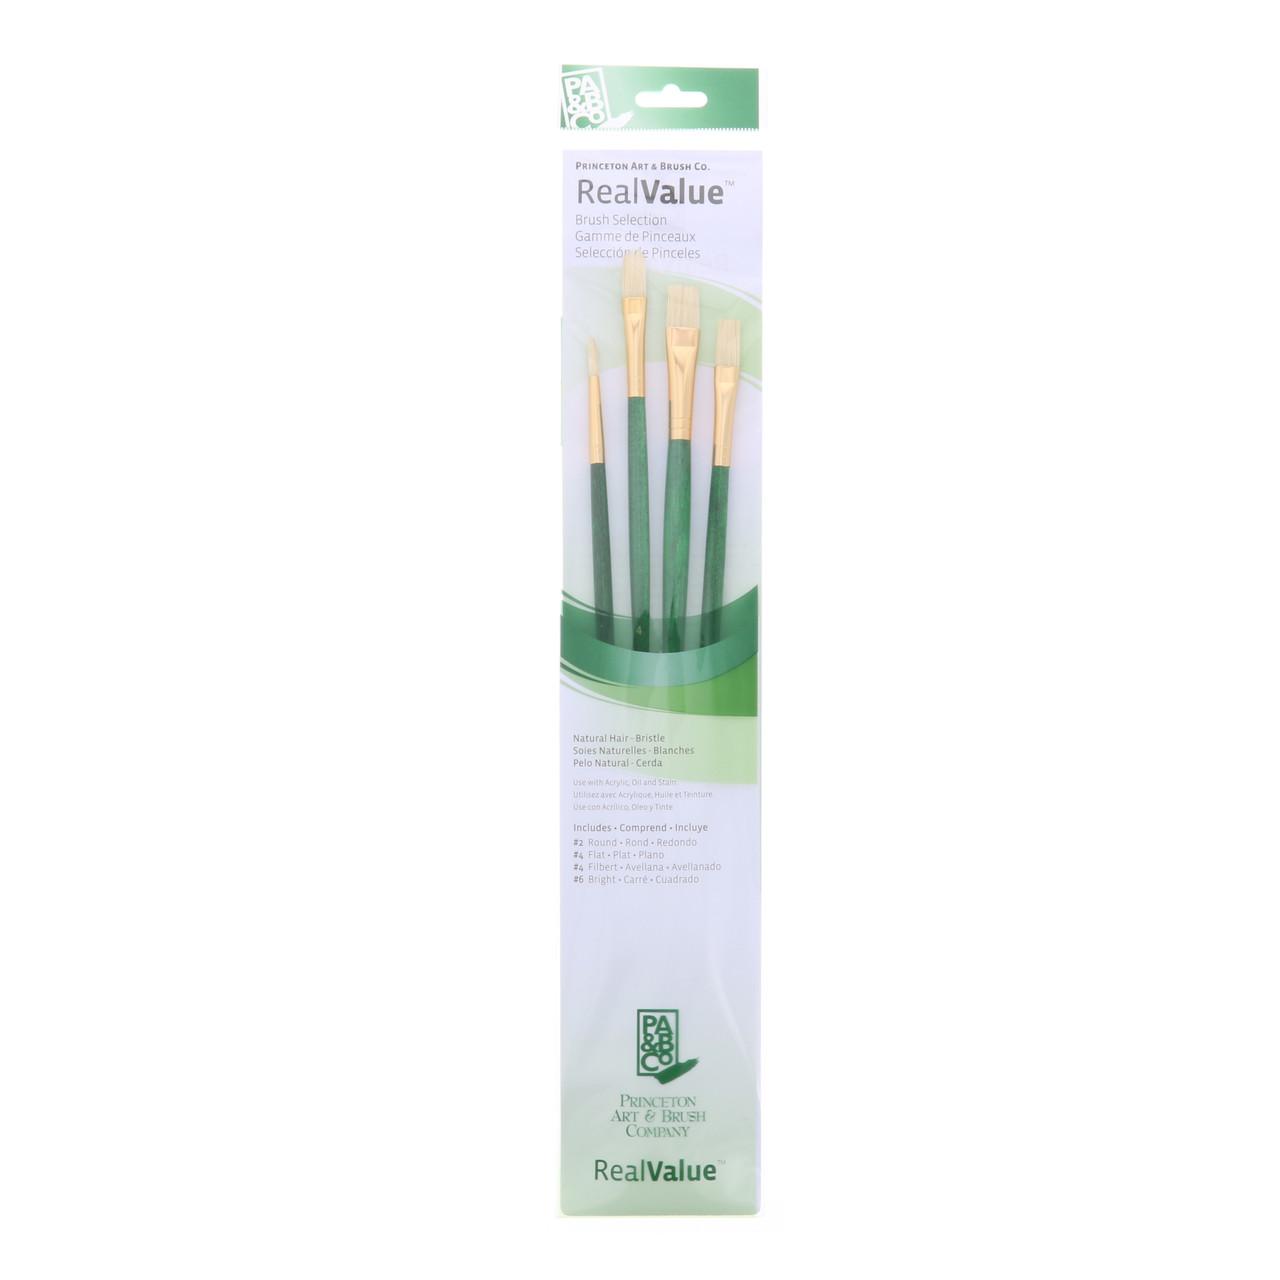 Natural Bristle 4-Brush Set Round 2, Flat 4, Filbert 4, Bright 6